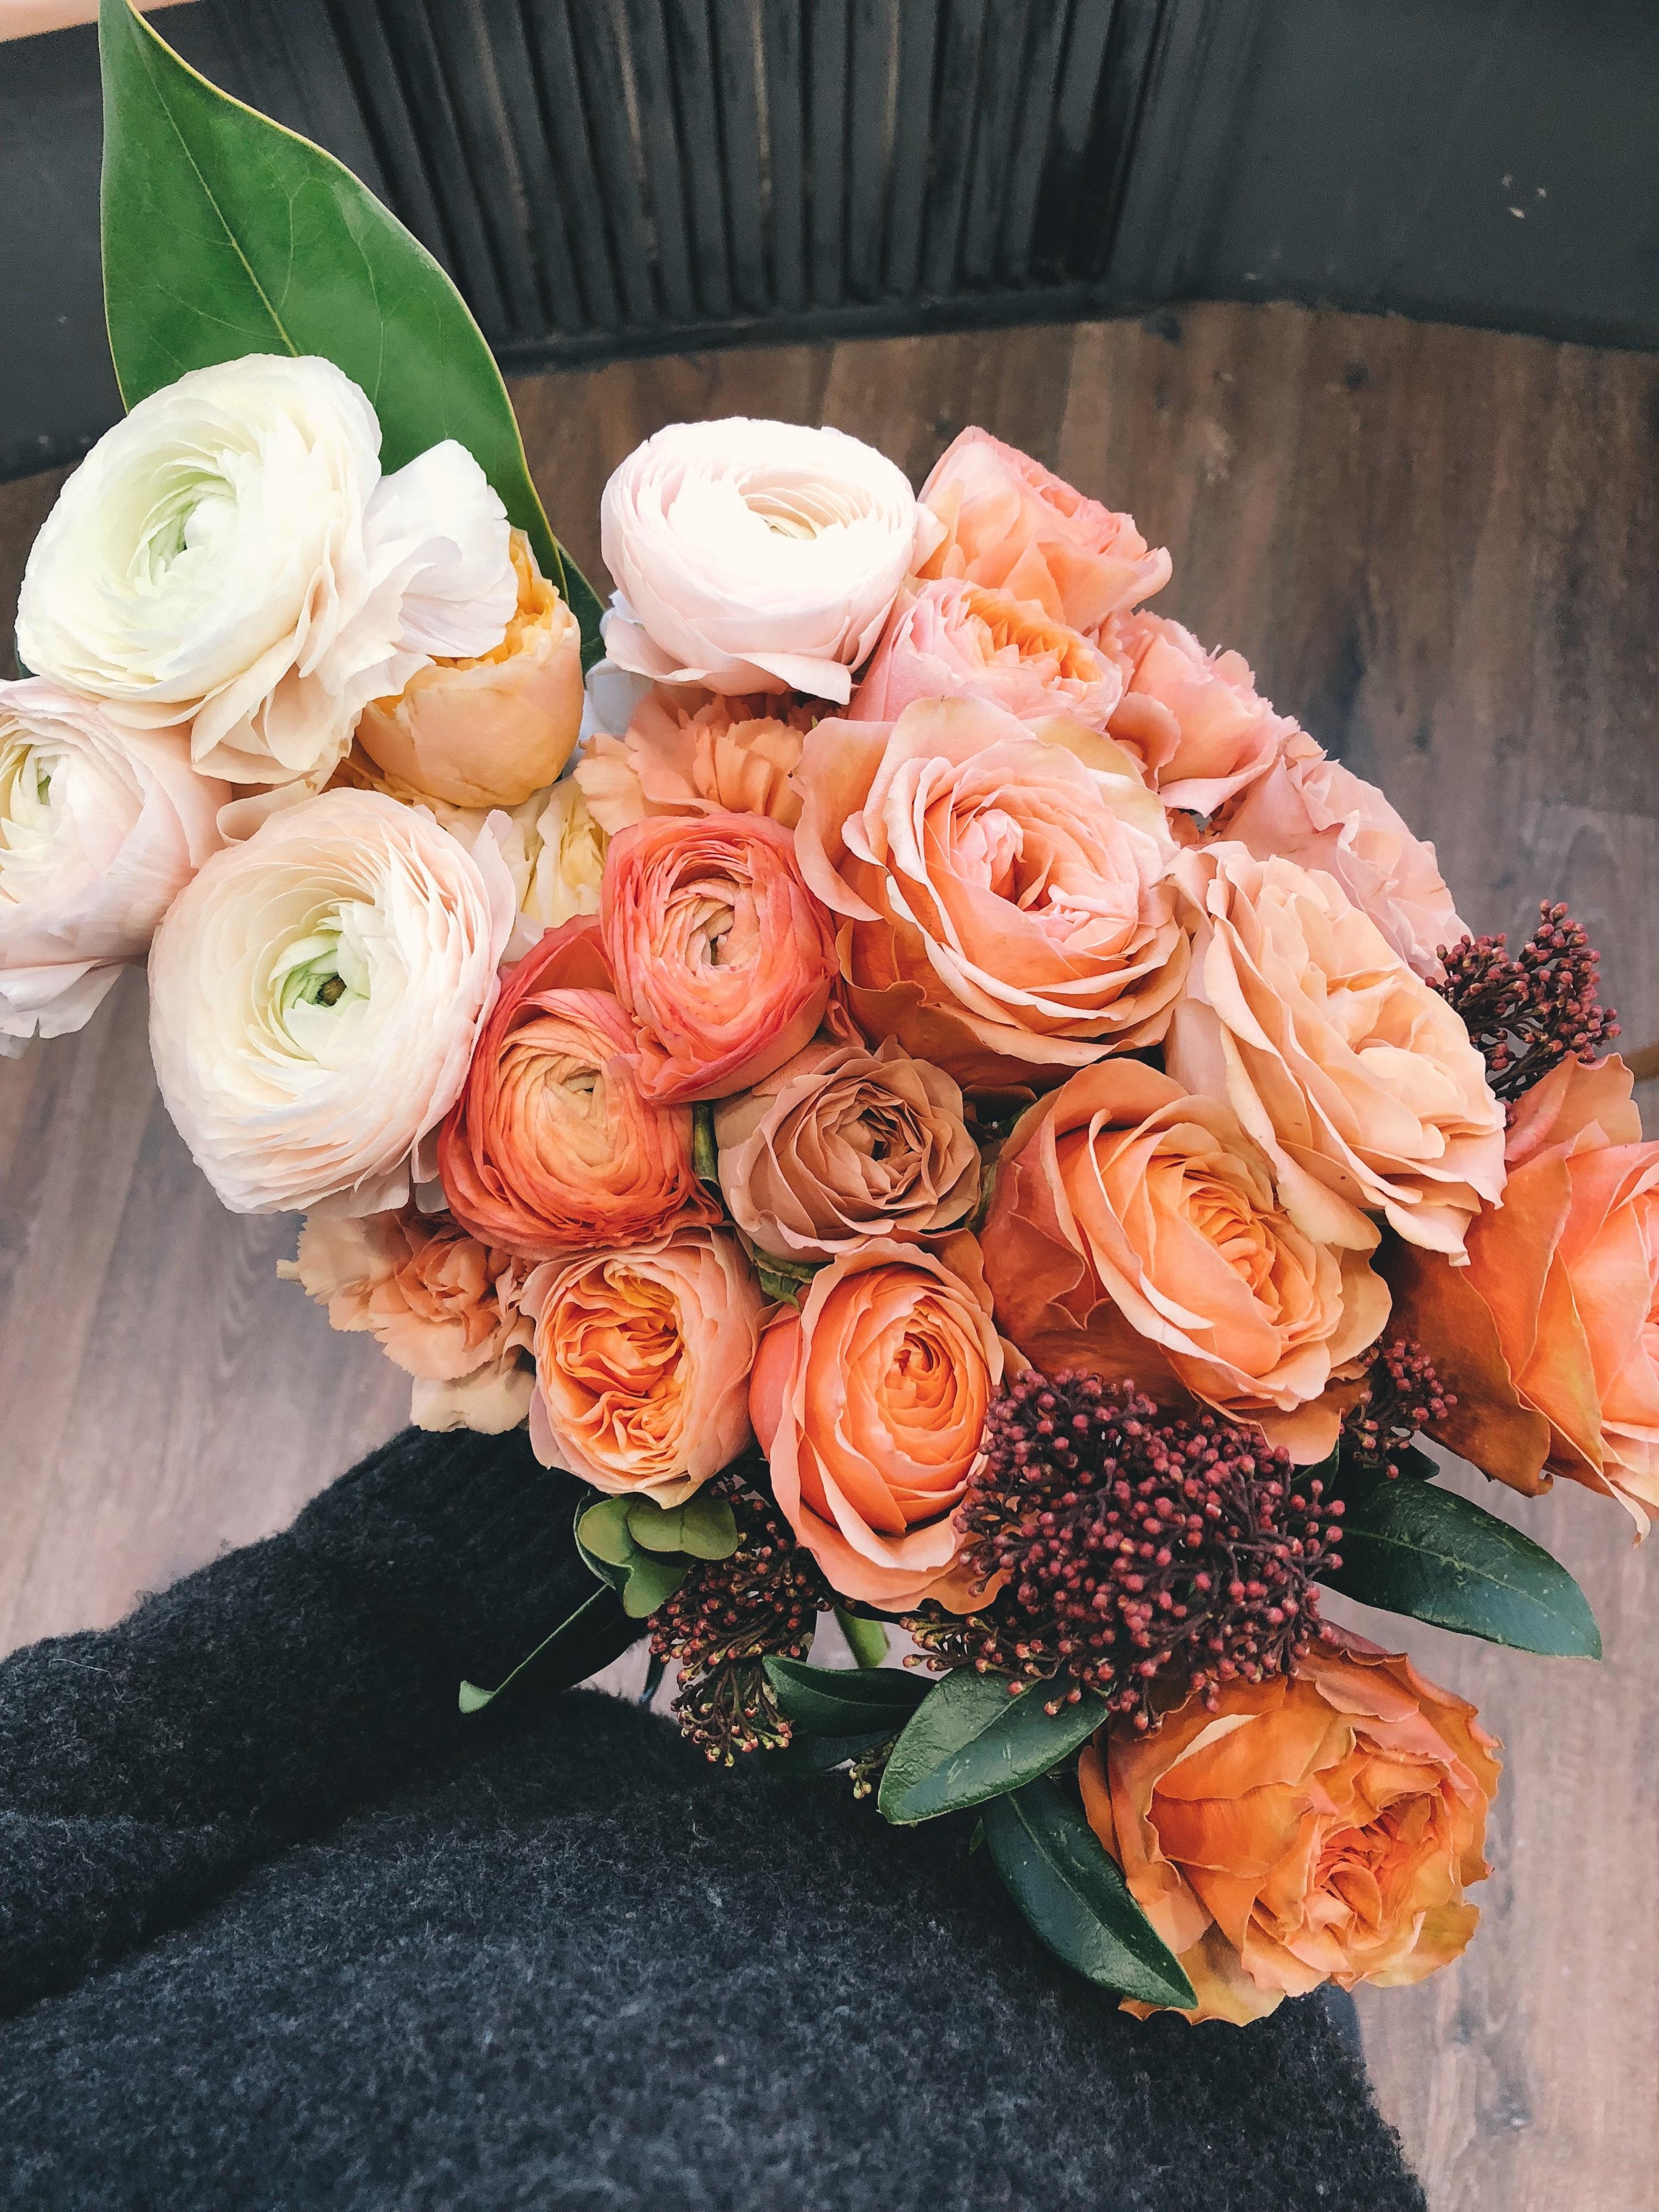 White And Orange Roses Bouquet Free Stock Photo